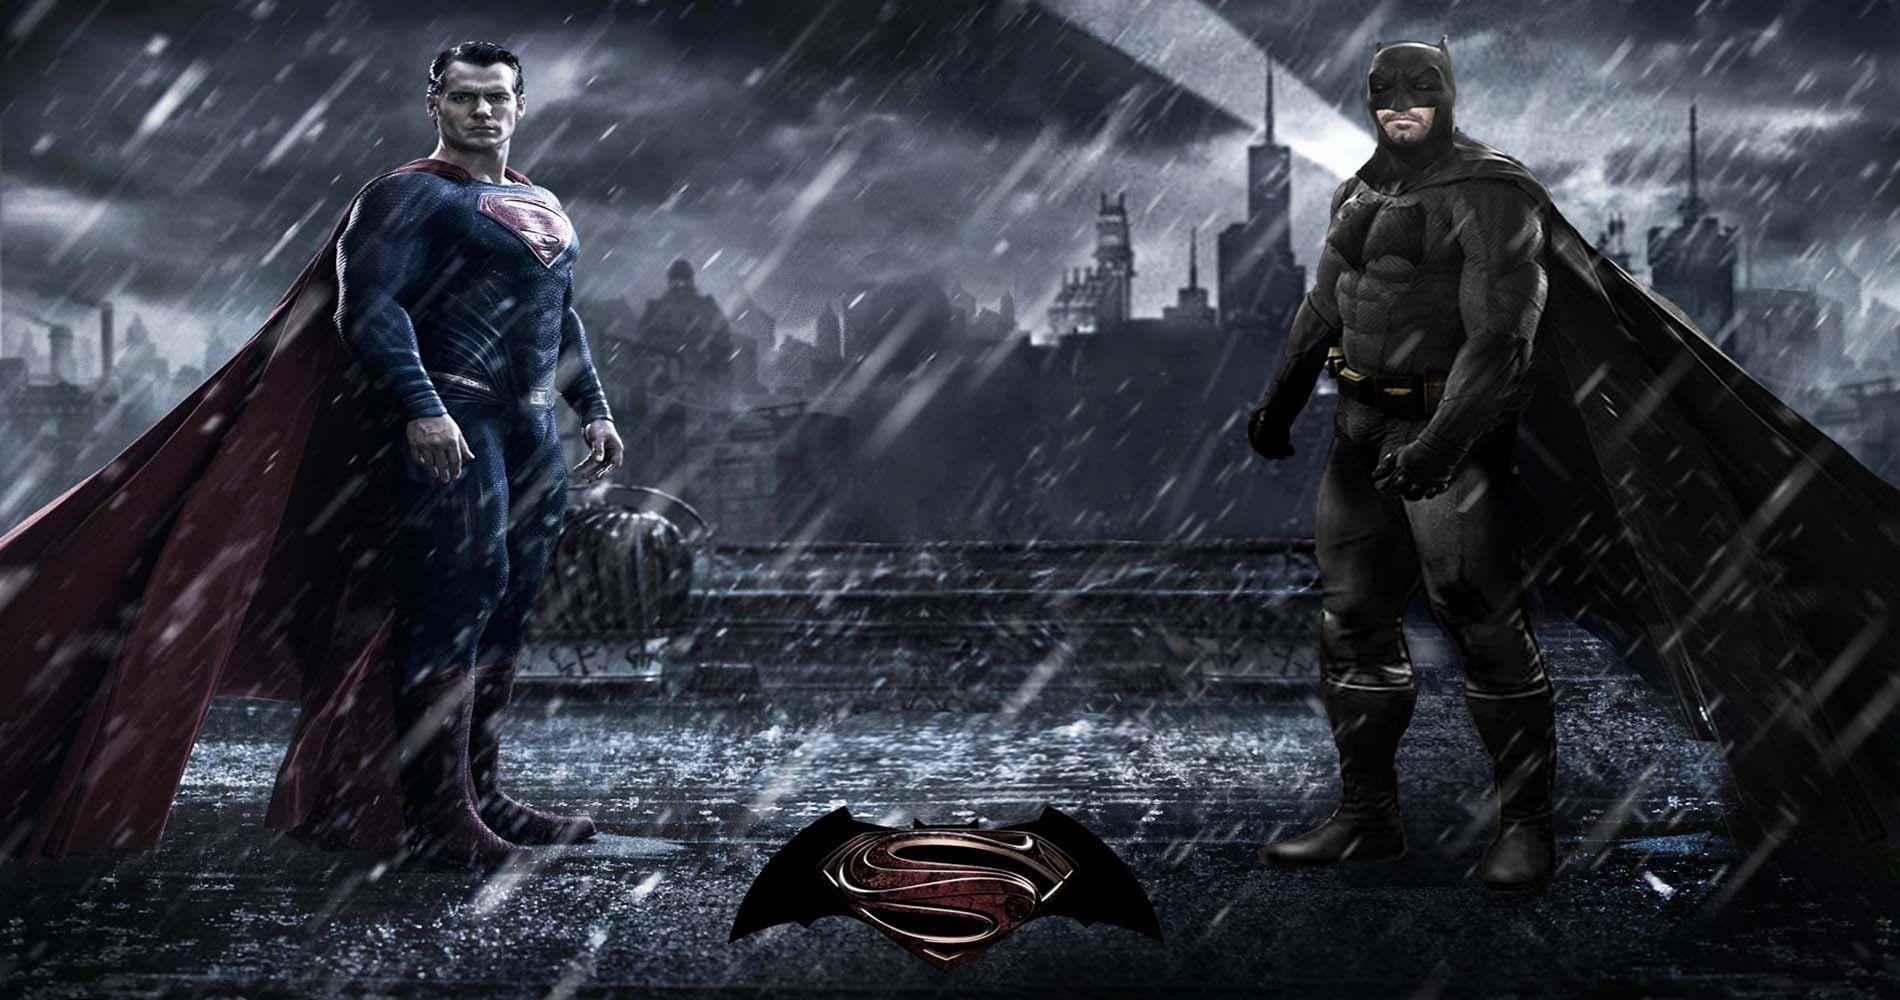 Batman V Superman Wallpaper P By LoganChico On DeviantArt 1920x1080 Vs Wallpapers 48